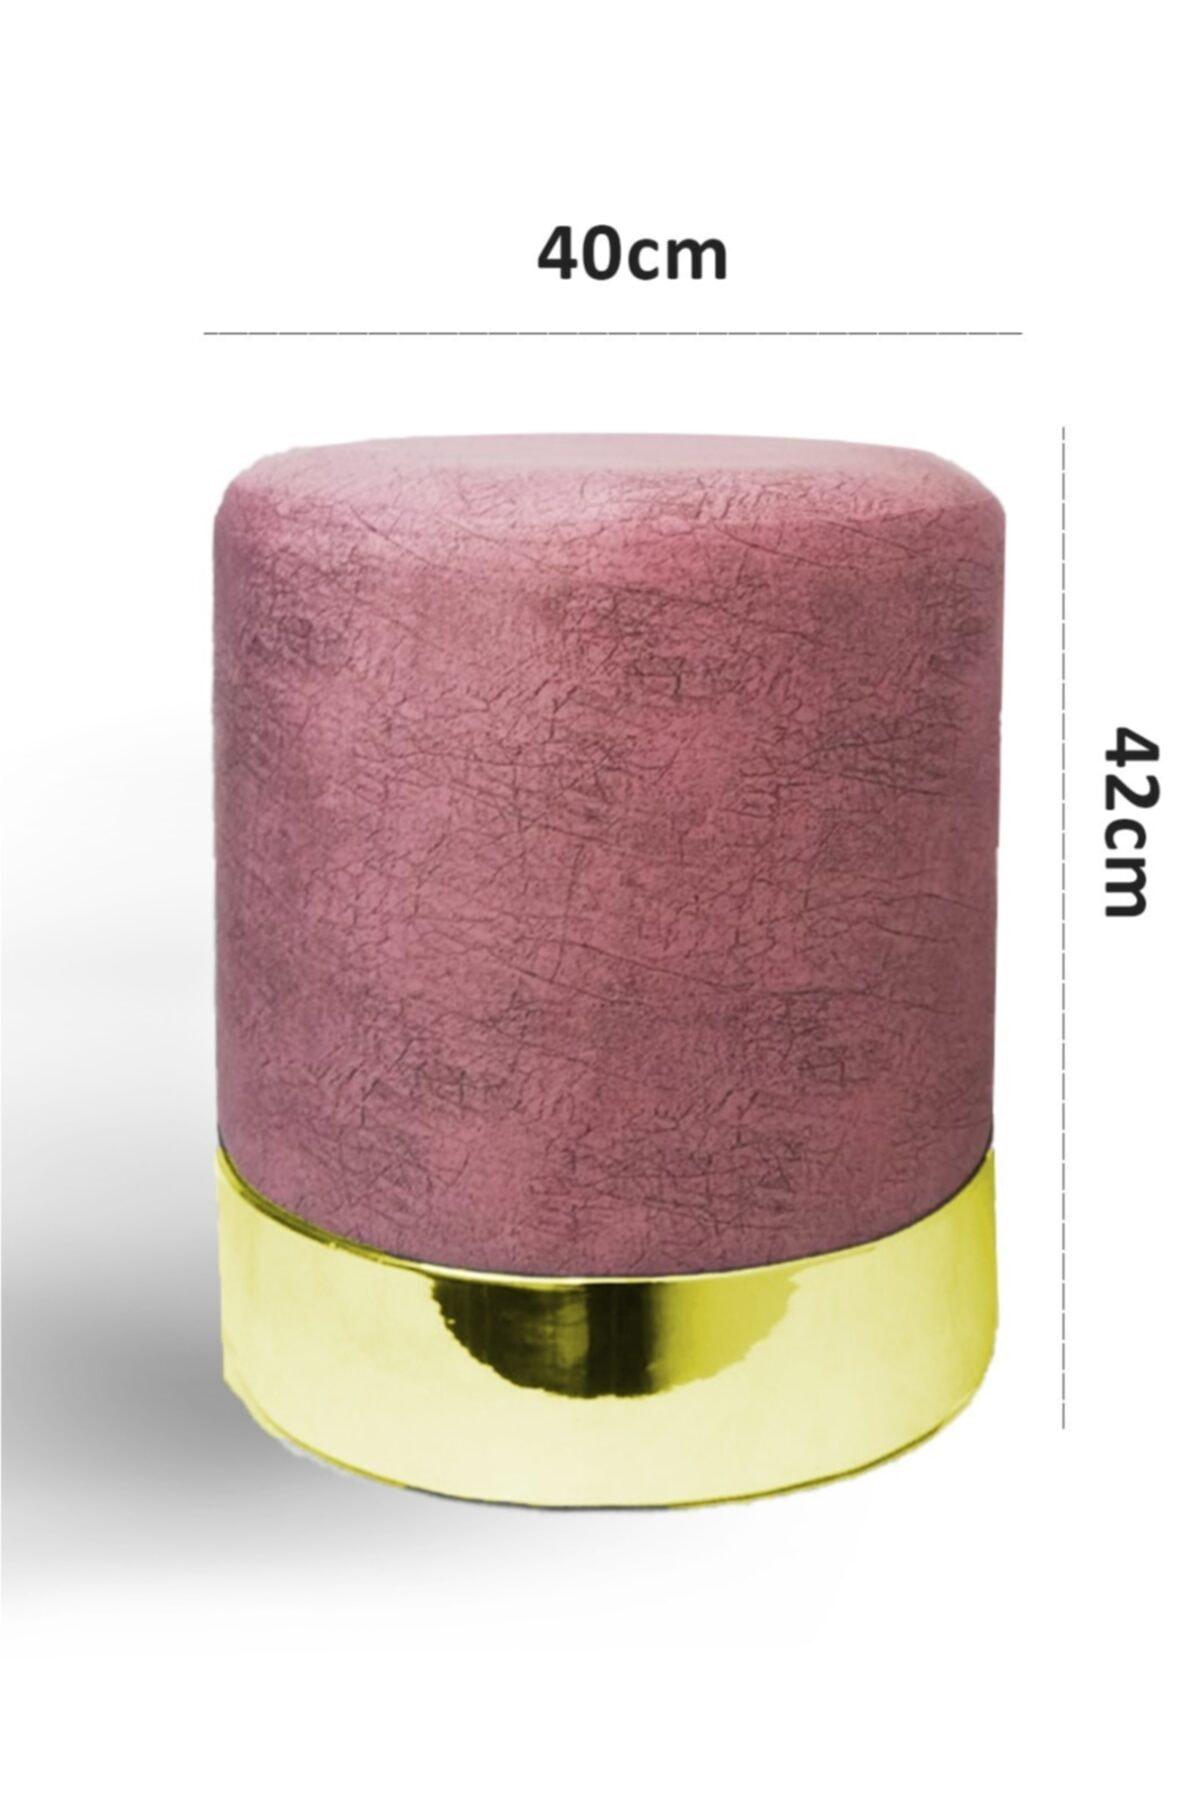 Zem Queen Rose - Gold Puf 2